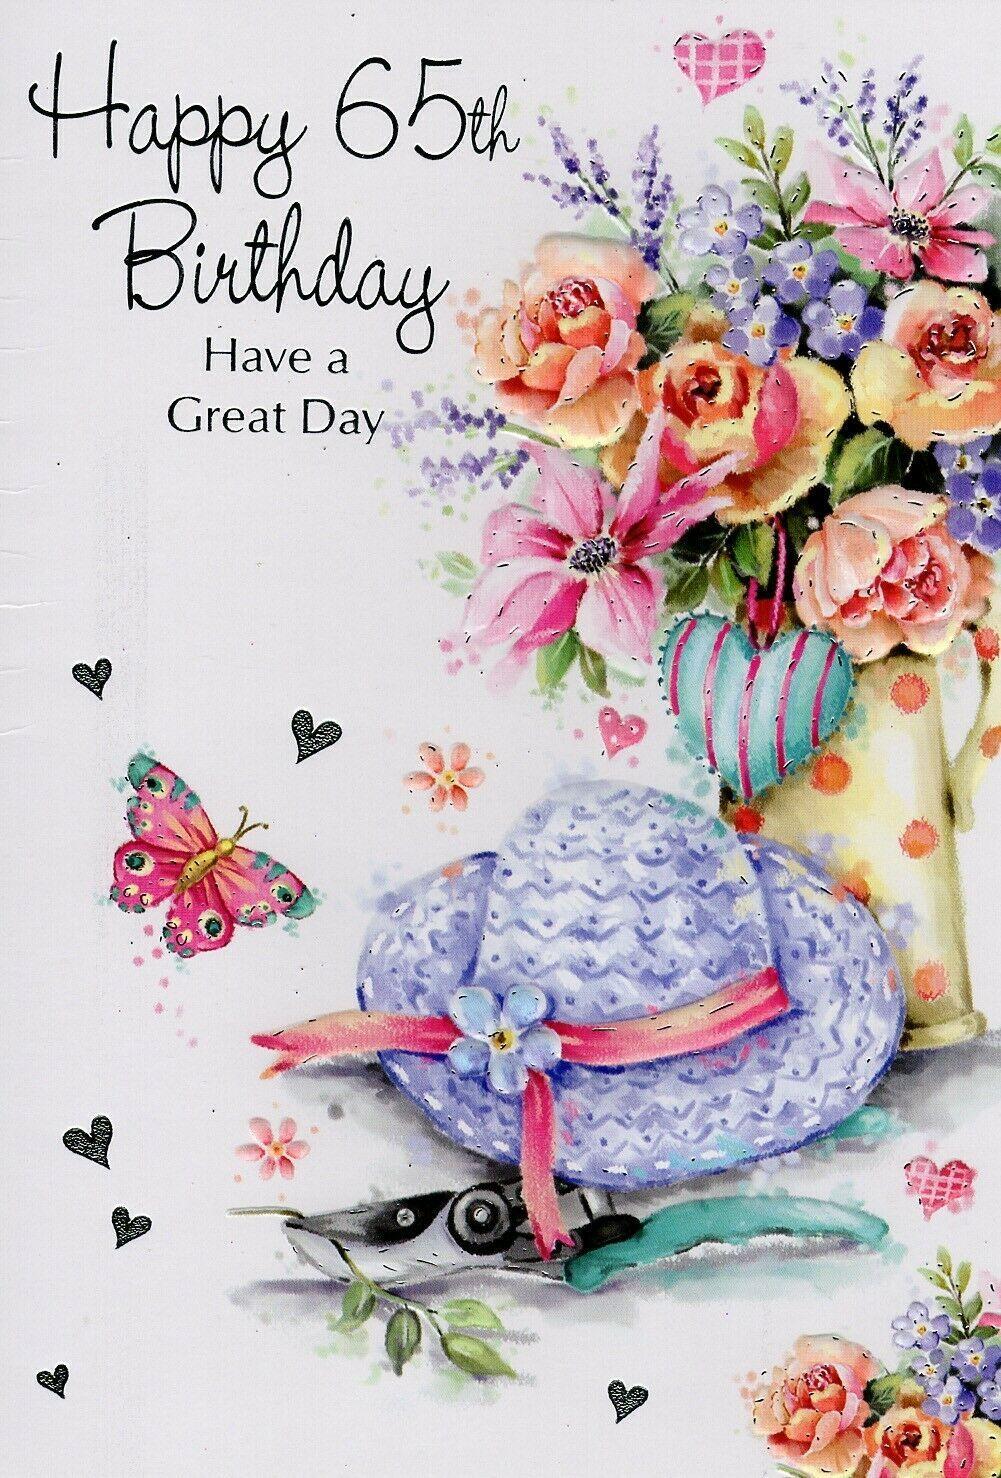 65th Female Birthday Greeting Card Multiple Designs Free P P Ebay Birthday Greeting Cards 65th Birthday Birthday Greetings